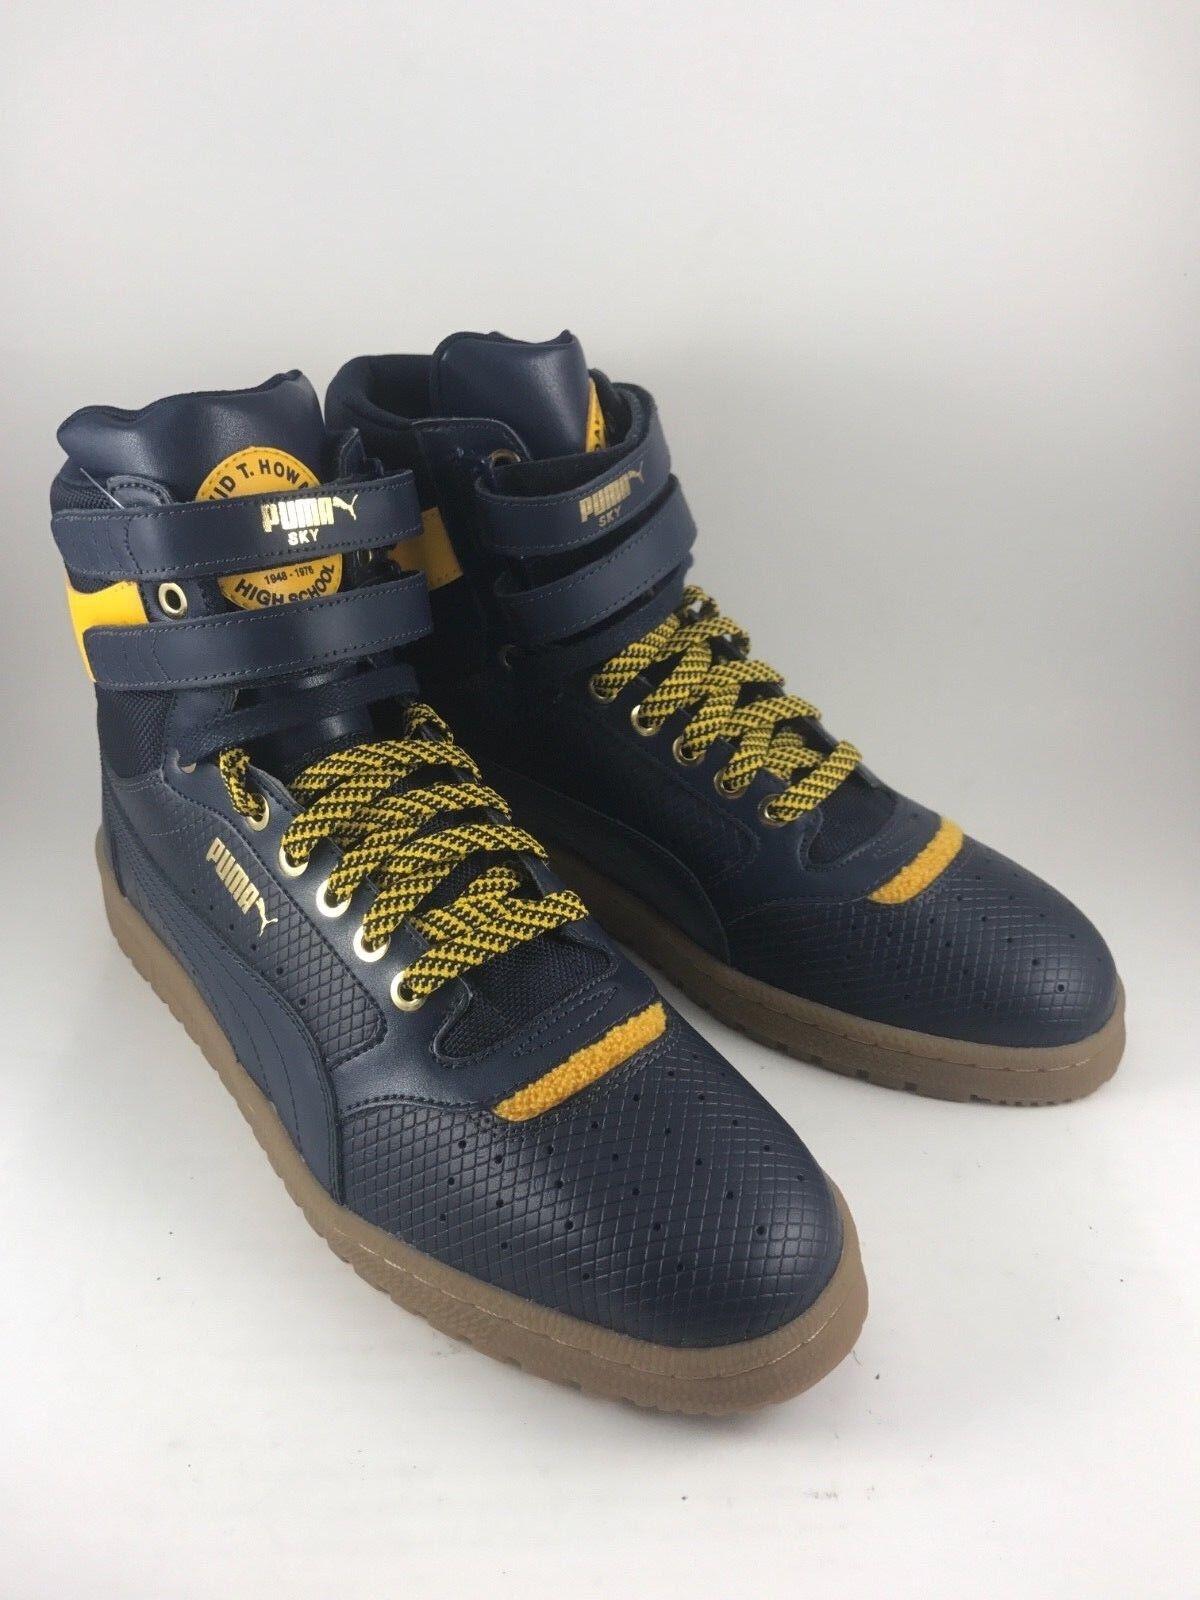 Puma Contact Contact Contact Sky David T Howard HighSchool Mens11.5 13 bluee Yellow HiTopSneakers 10e5bc